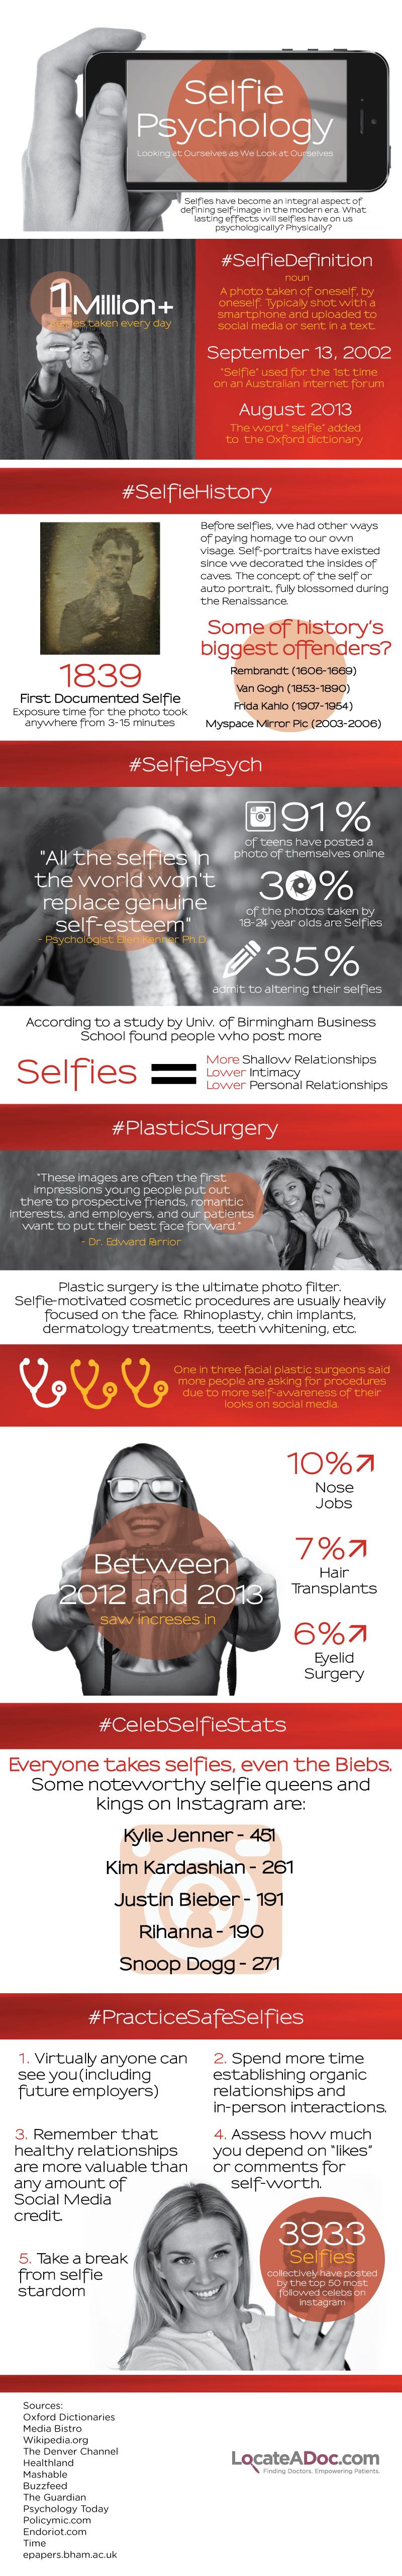 selfie infographic